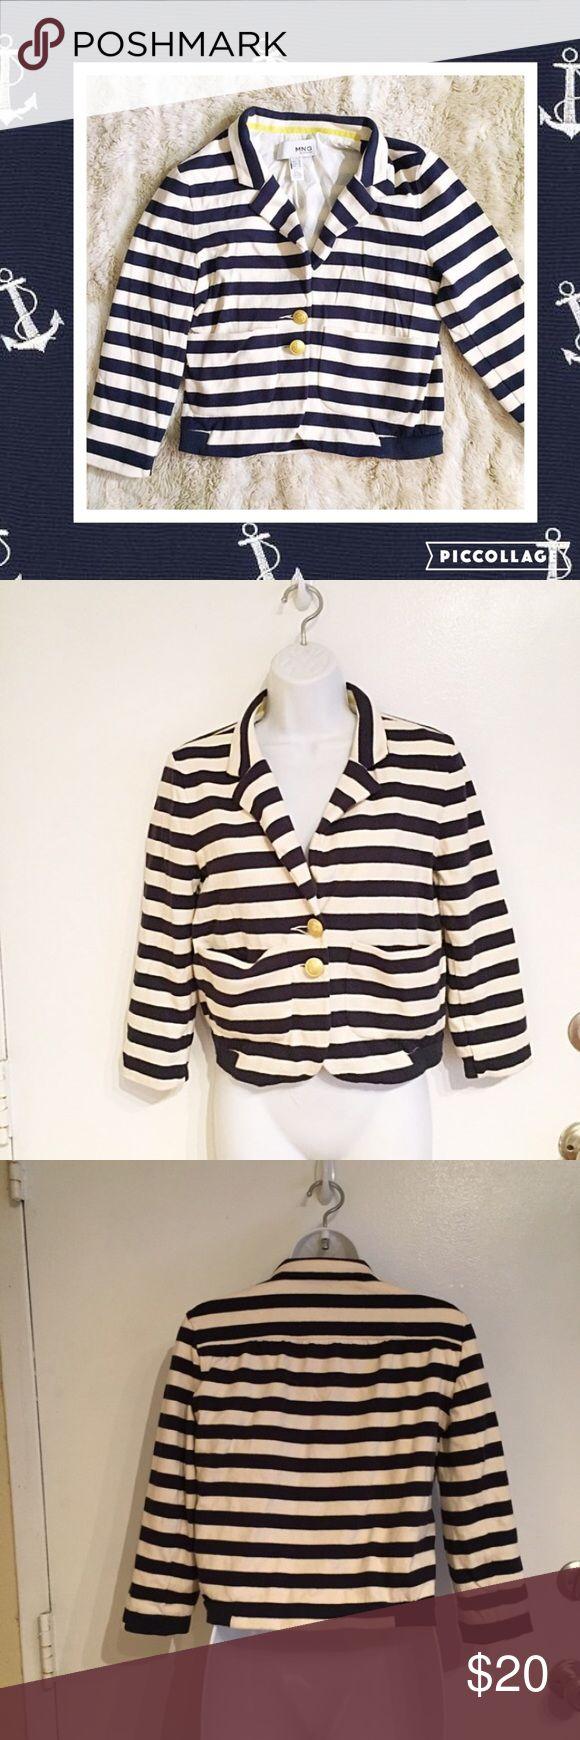 MNG Mango Nautical Chic Striped Blazer Jacket MNG by Mango. Striped slightly cropped Blazer jacket. Size medium. Has a cool nautical sailor vibe.  #mng #mango #cropped #blazer #jacket #nautical #sailor #striped #medium #punkydoodle  No modeling Smoke free home  I do discount bundles Mango Jackets & Coats Blazers